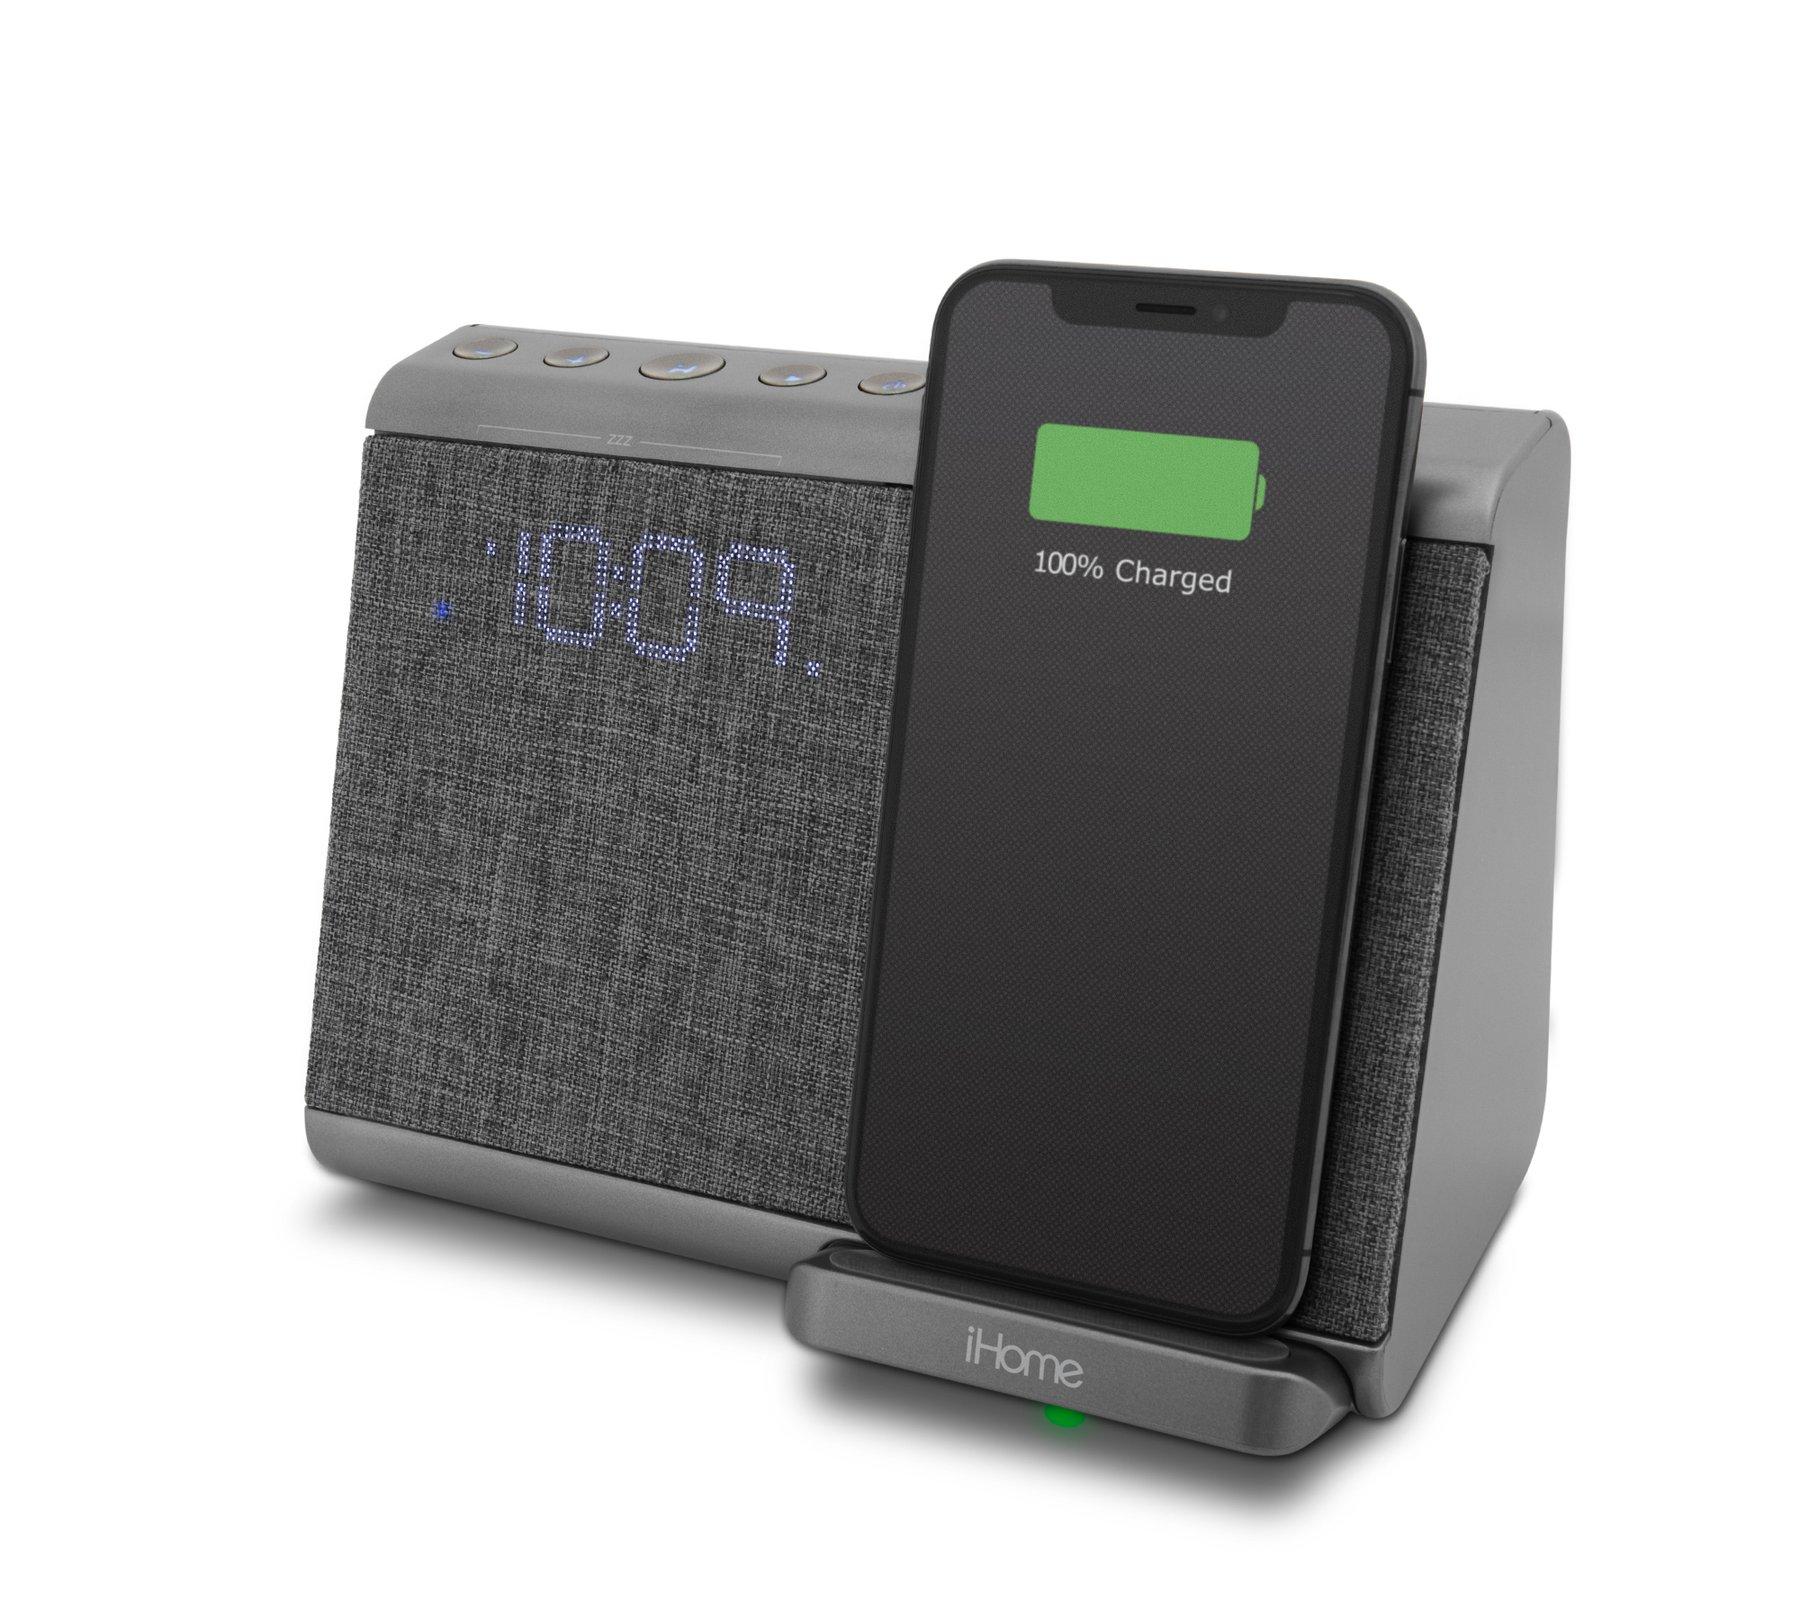 iHome wireless (Qi) charging Bluetooth alarm clock with USB